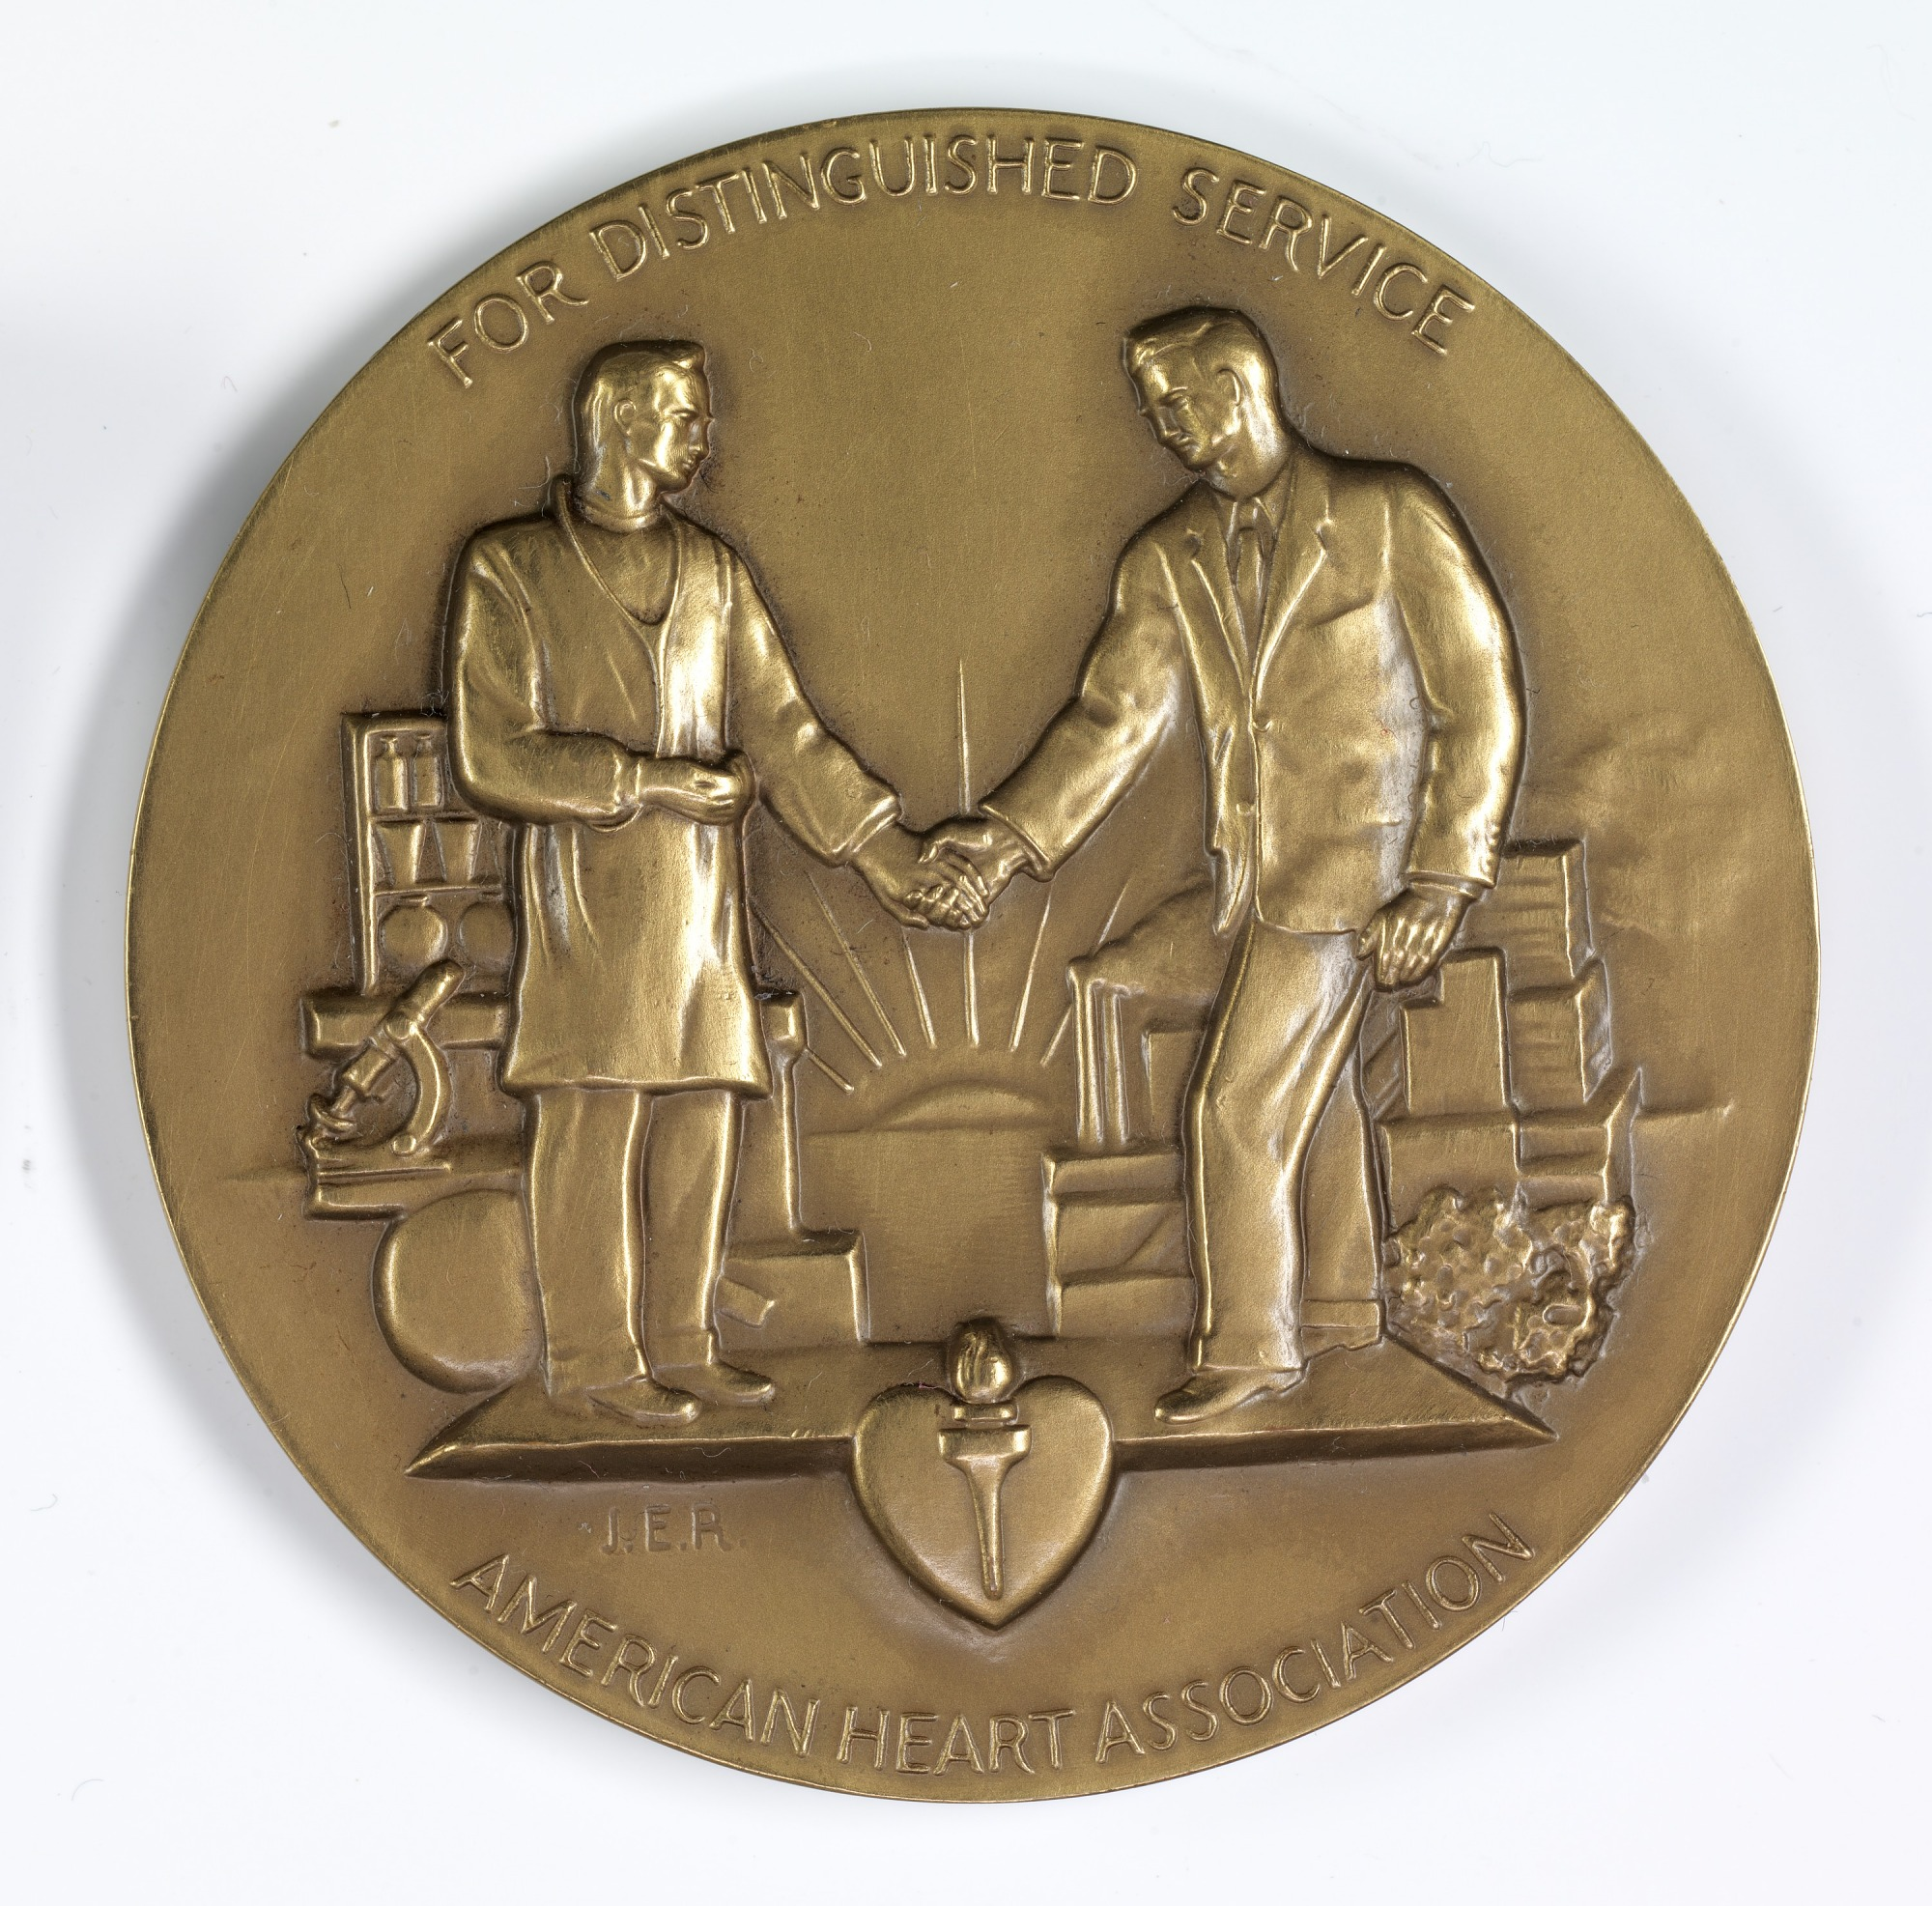 American Heart Association Medal